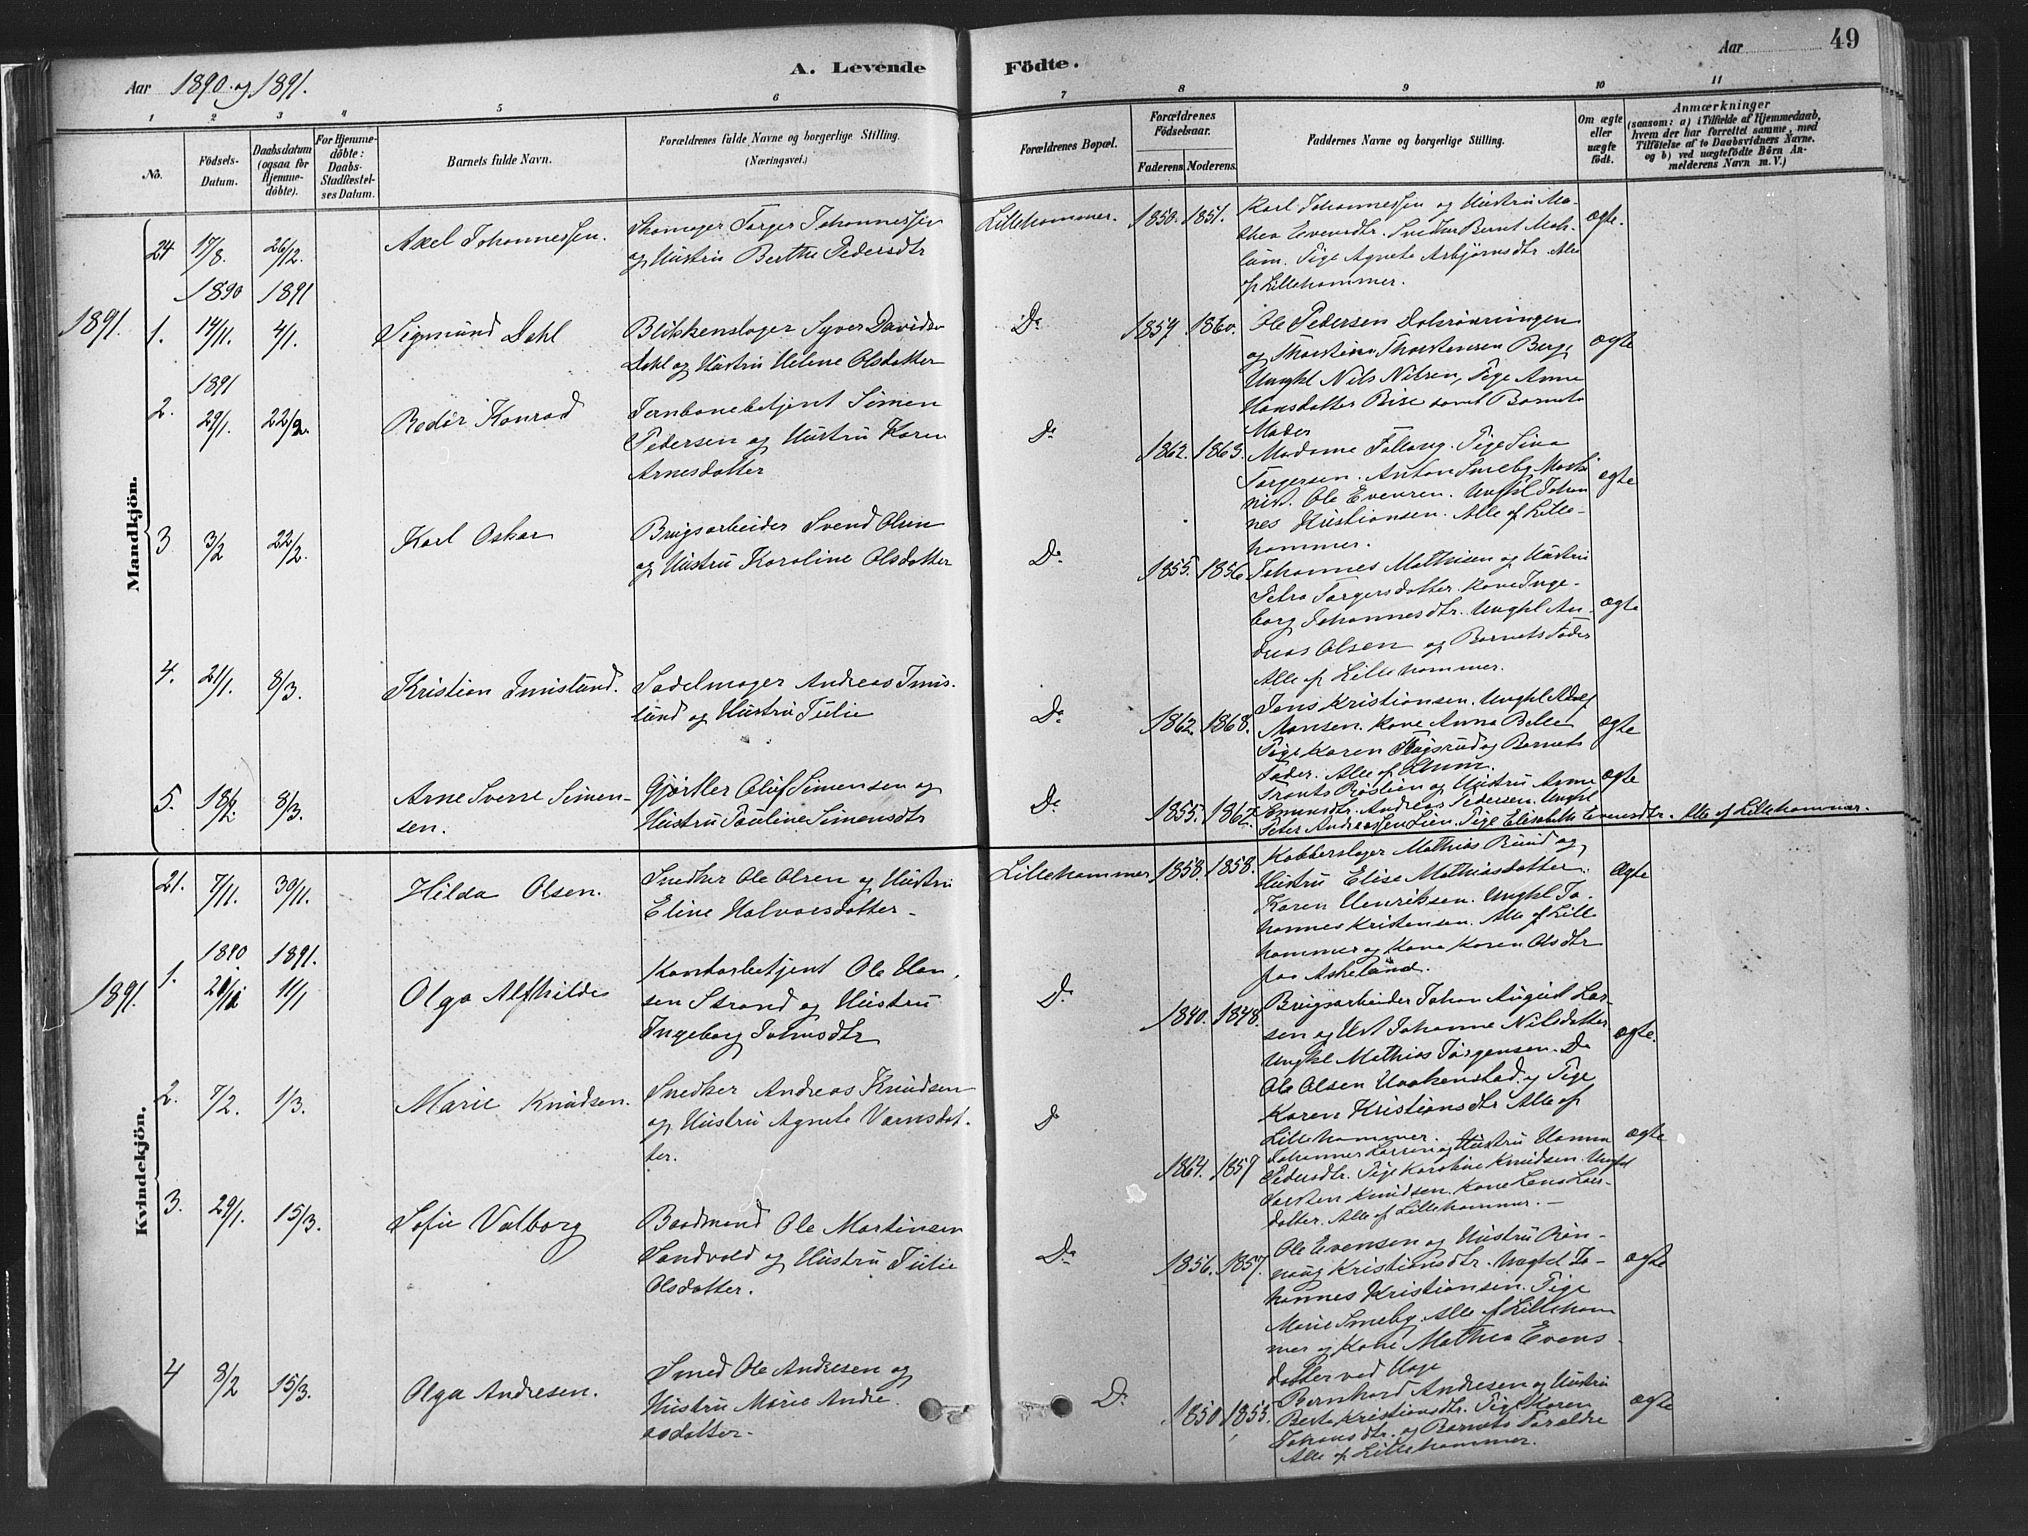 SAH, Fåberg prestekontor, H/Ha/Haa/L0010: Parish register (official) no. 10, 1879-1900, p. 49